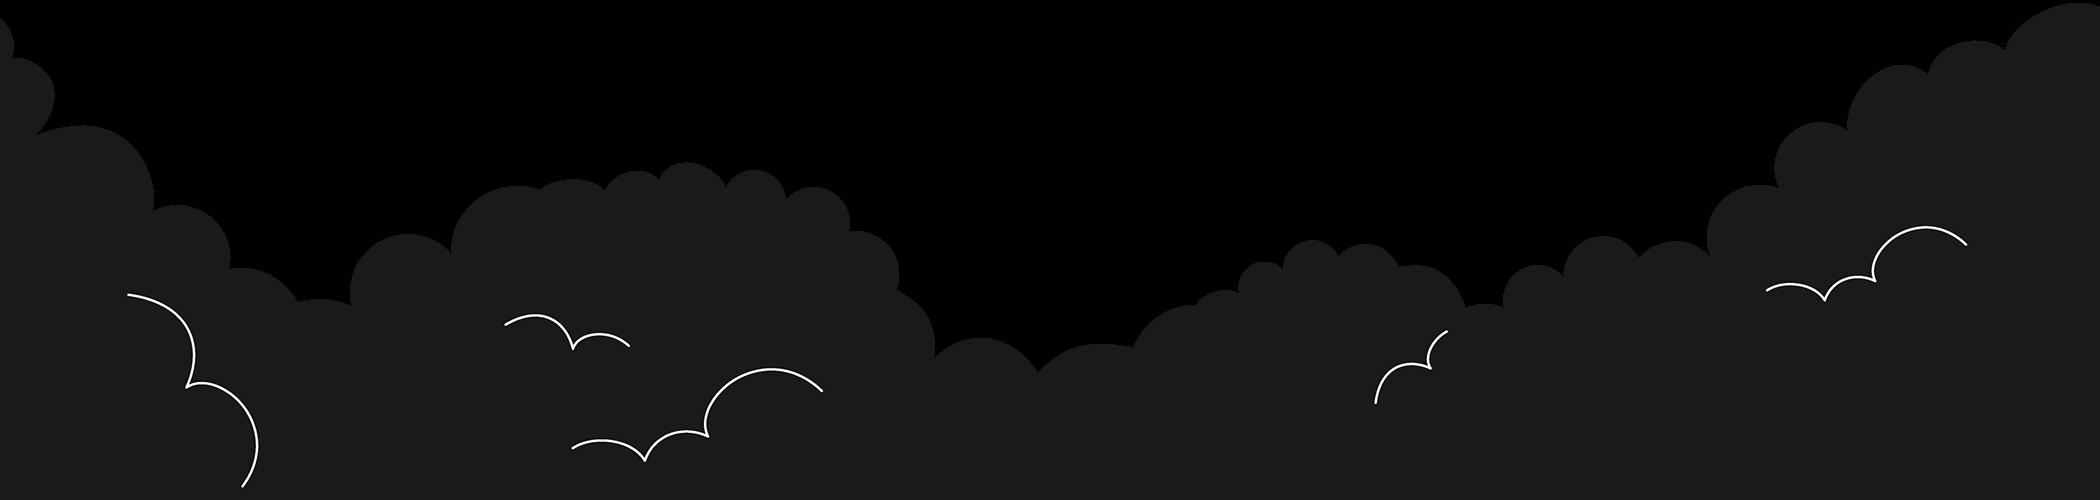 https://bisourcing.com/wp-content/uploads/2020/05/Startup-02.png